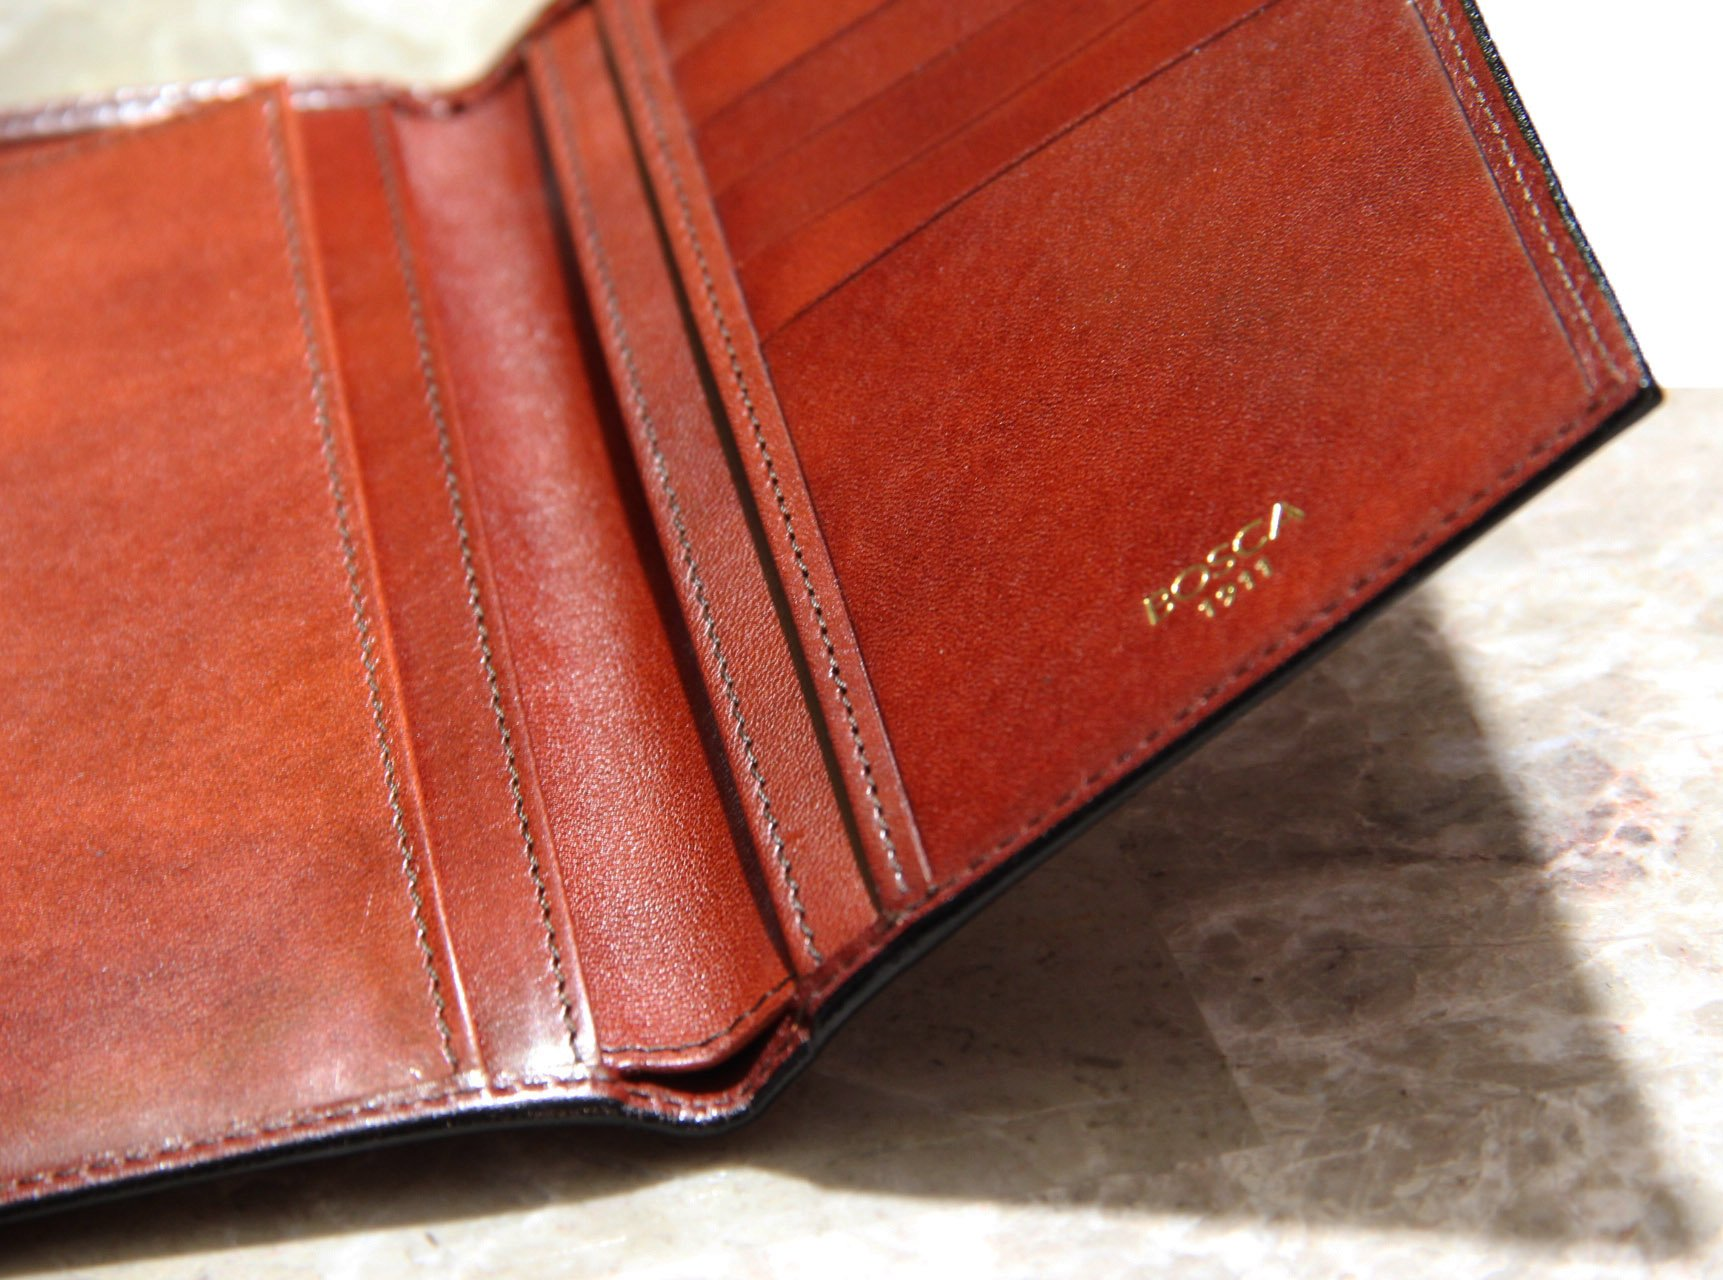 Bosca Old Leather Coat Pocket Wallet (One Size, Cognac)